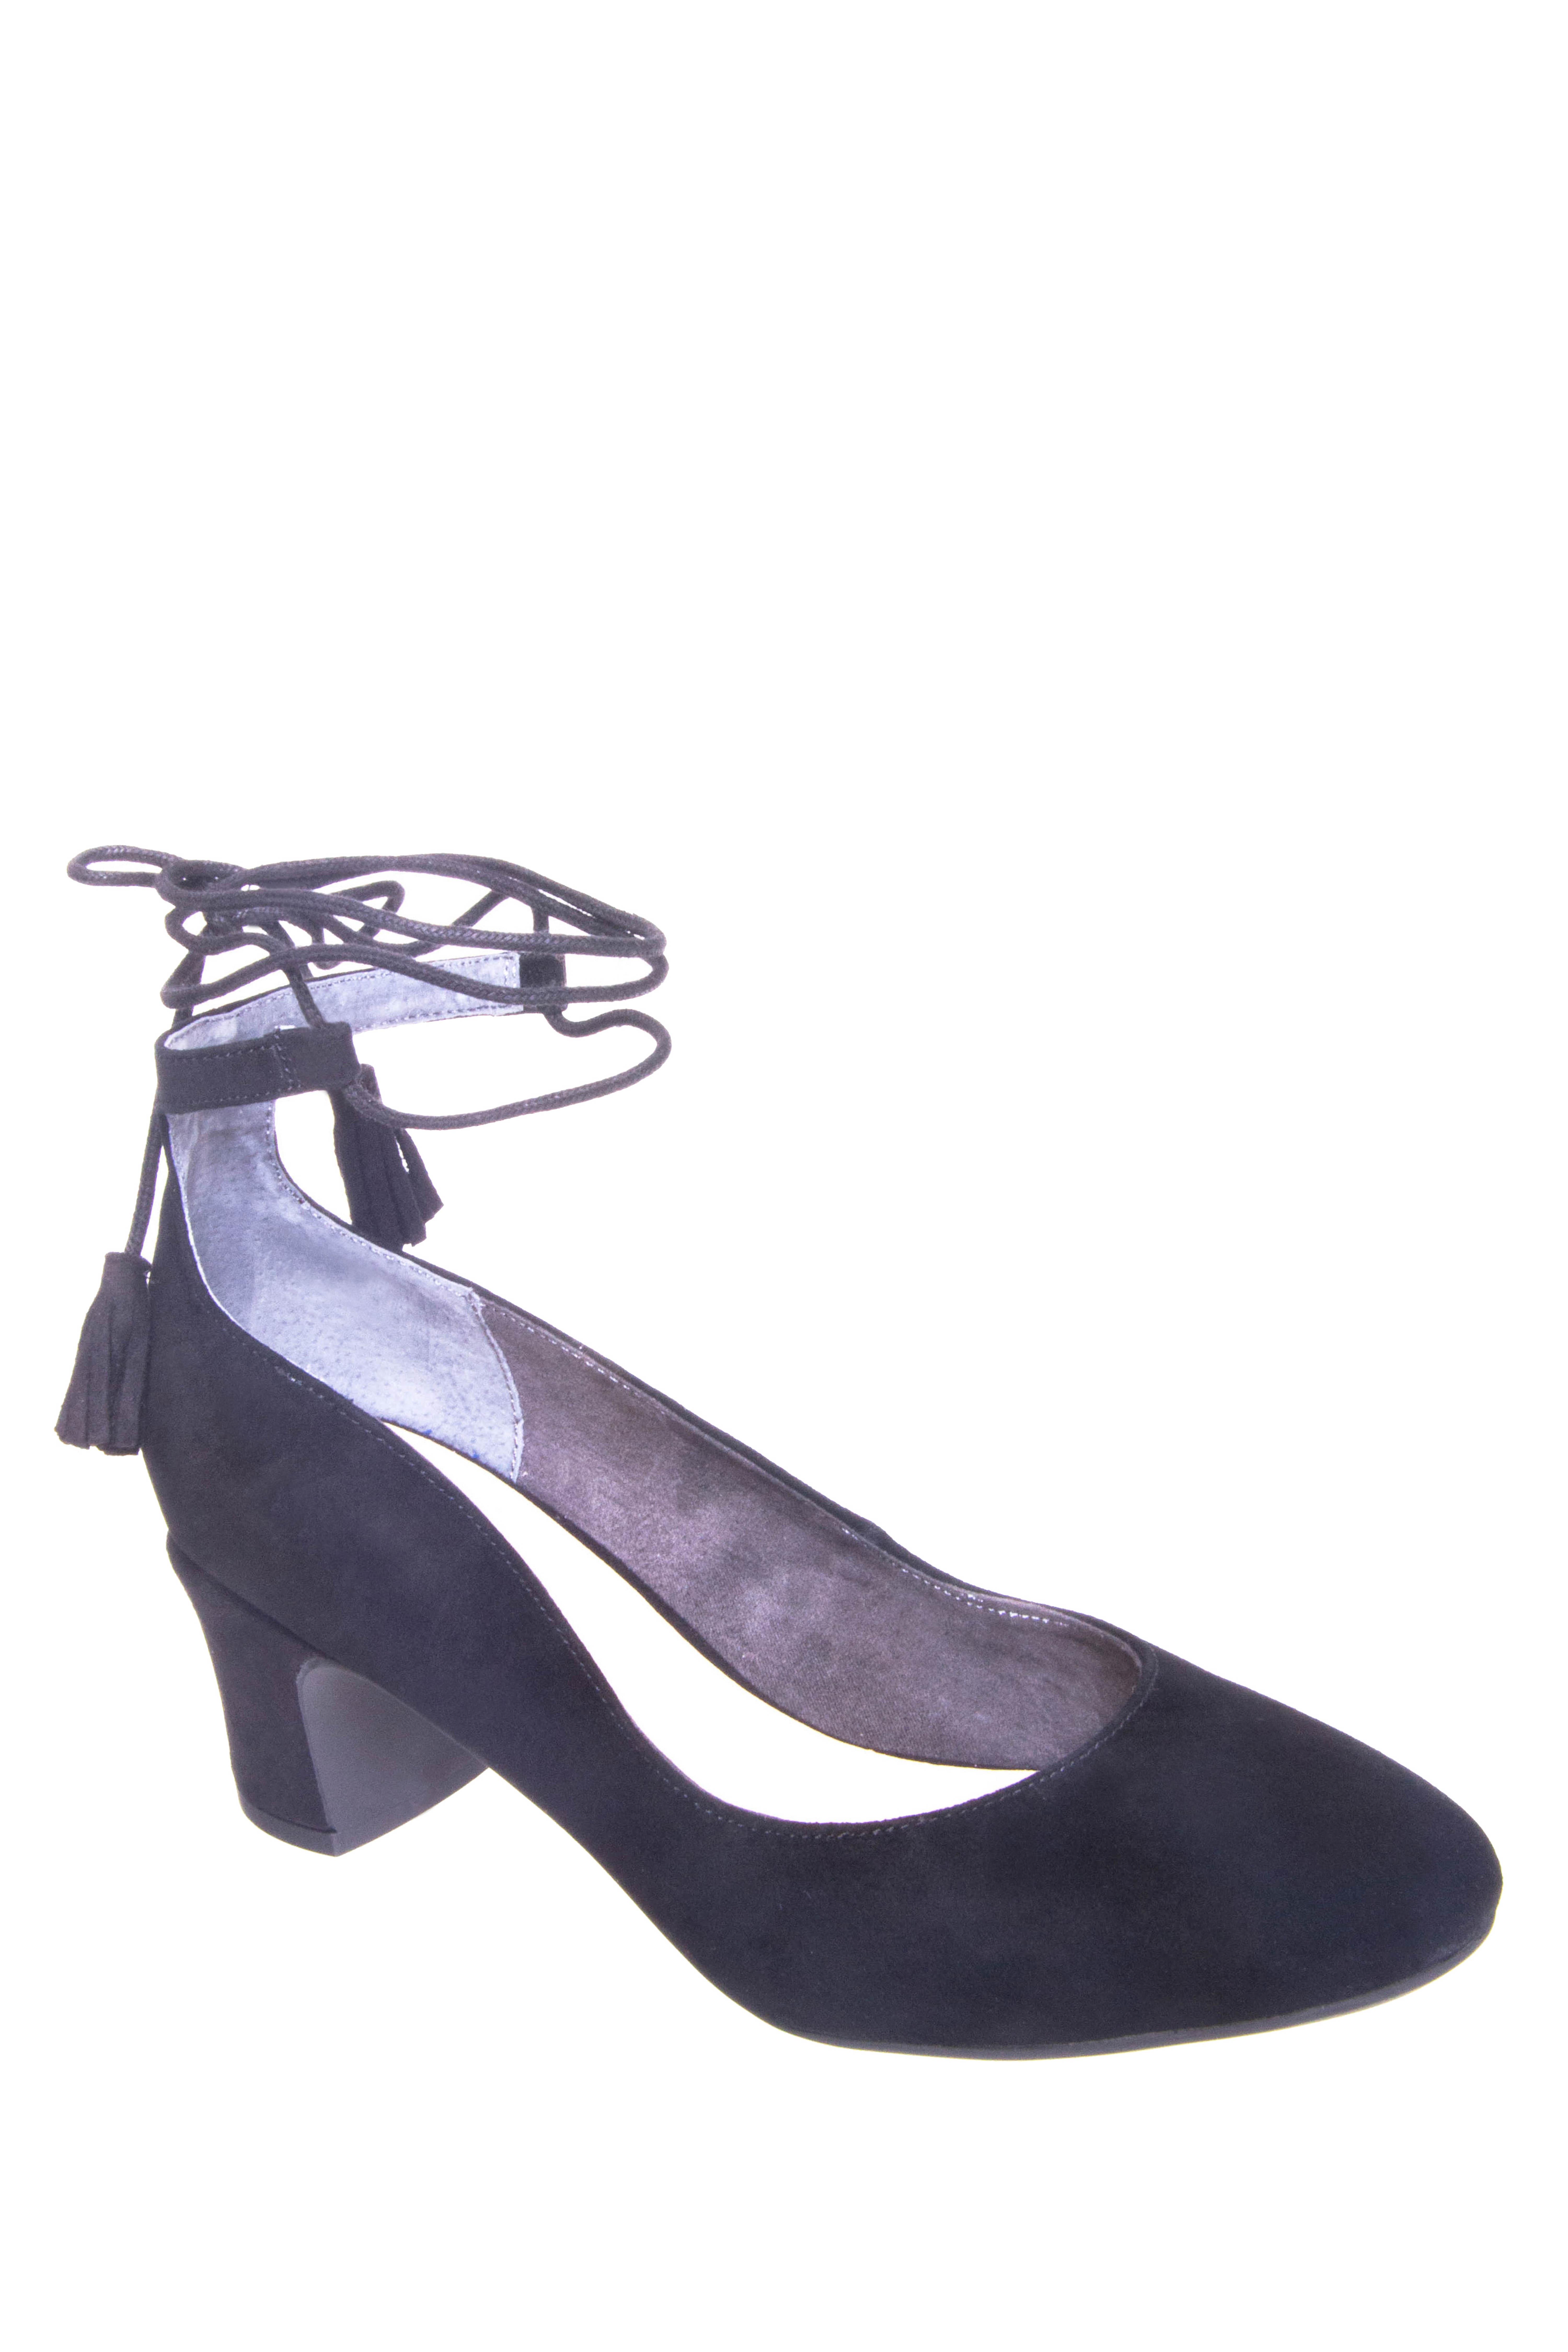 Seychelles Trick Mid Heel Pumps - Black